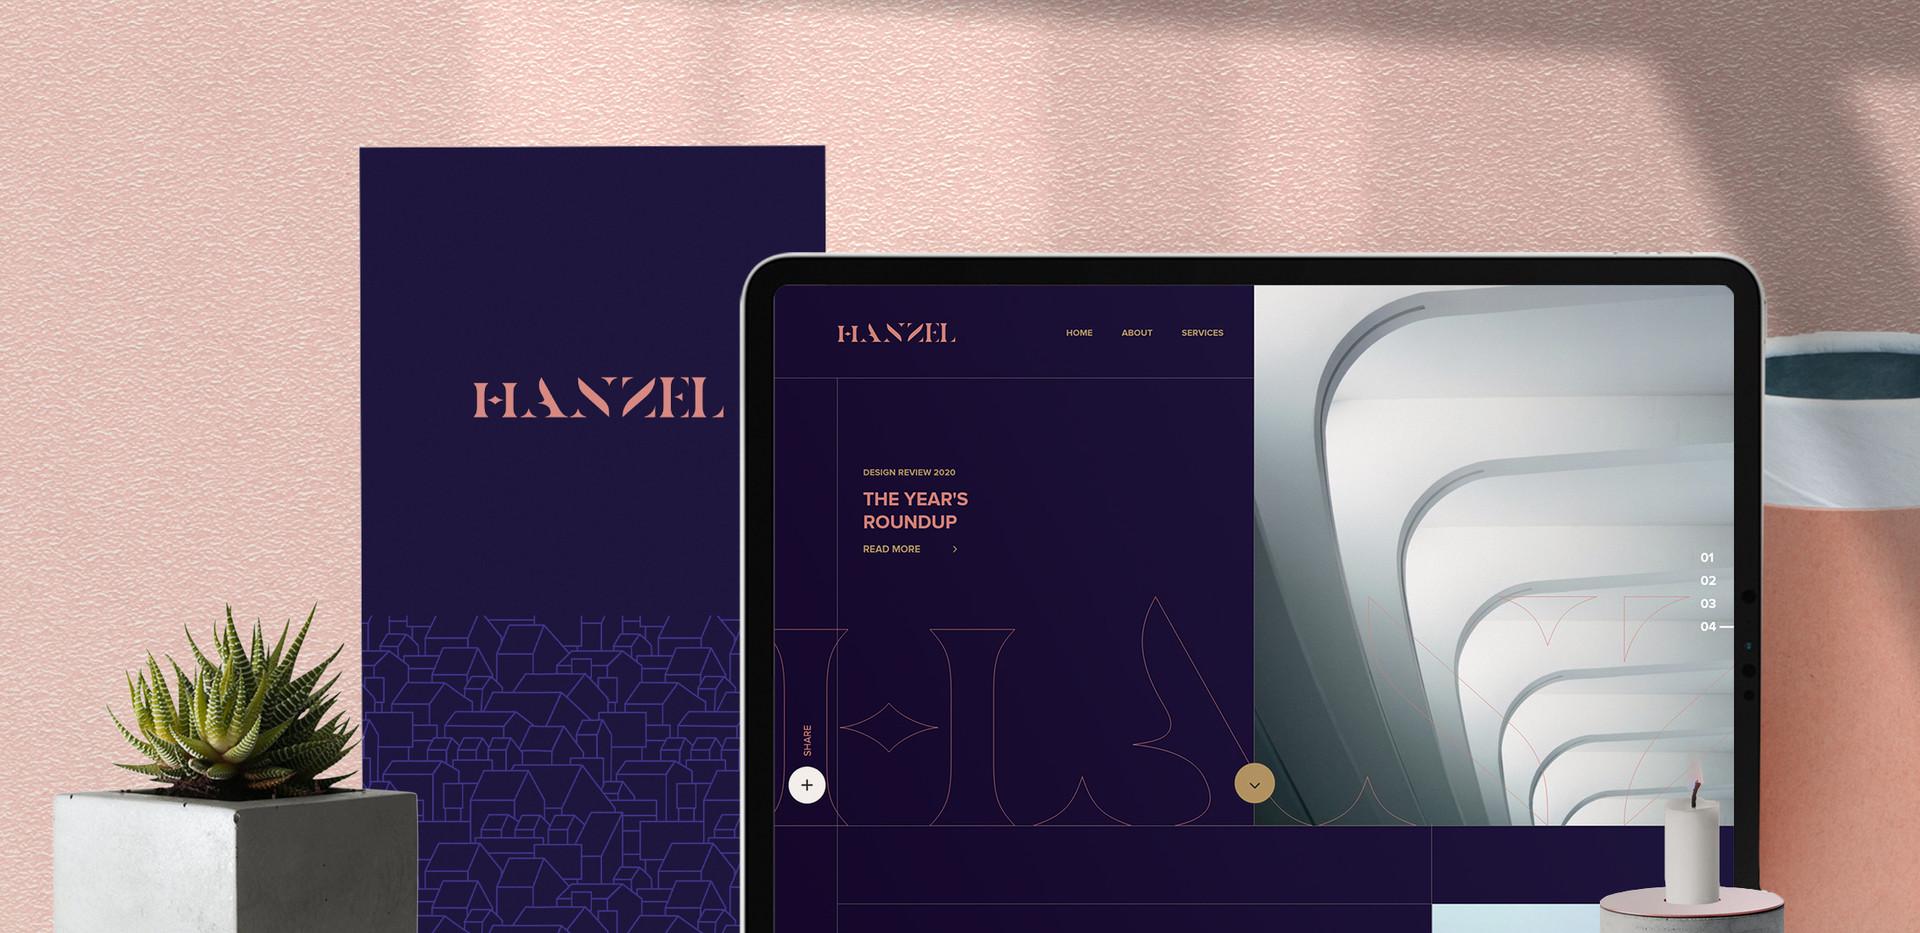 Hanzel Architects